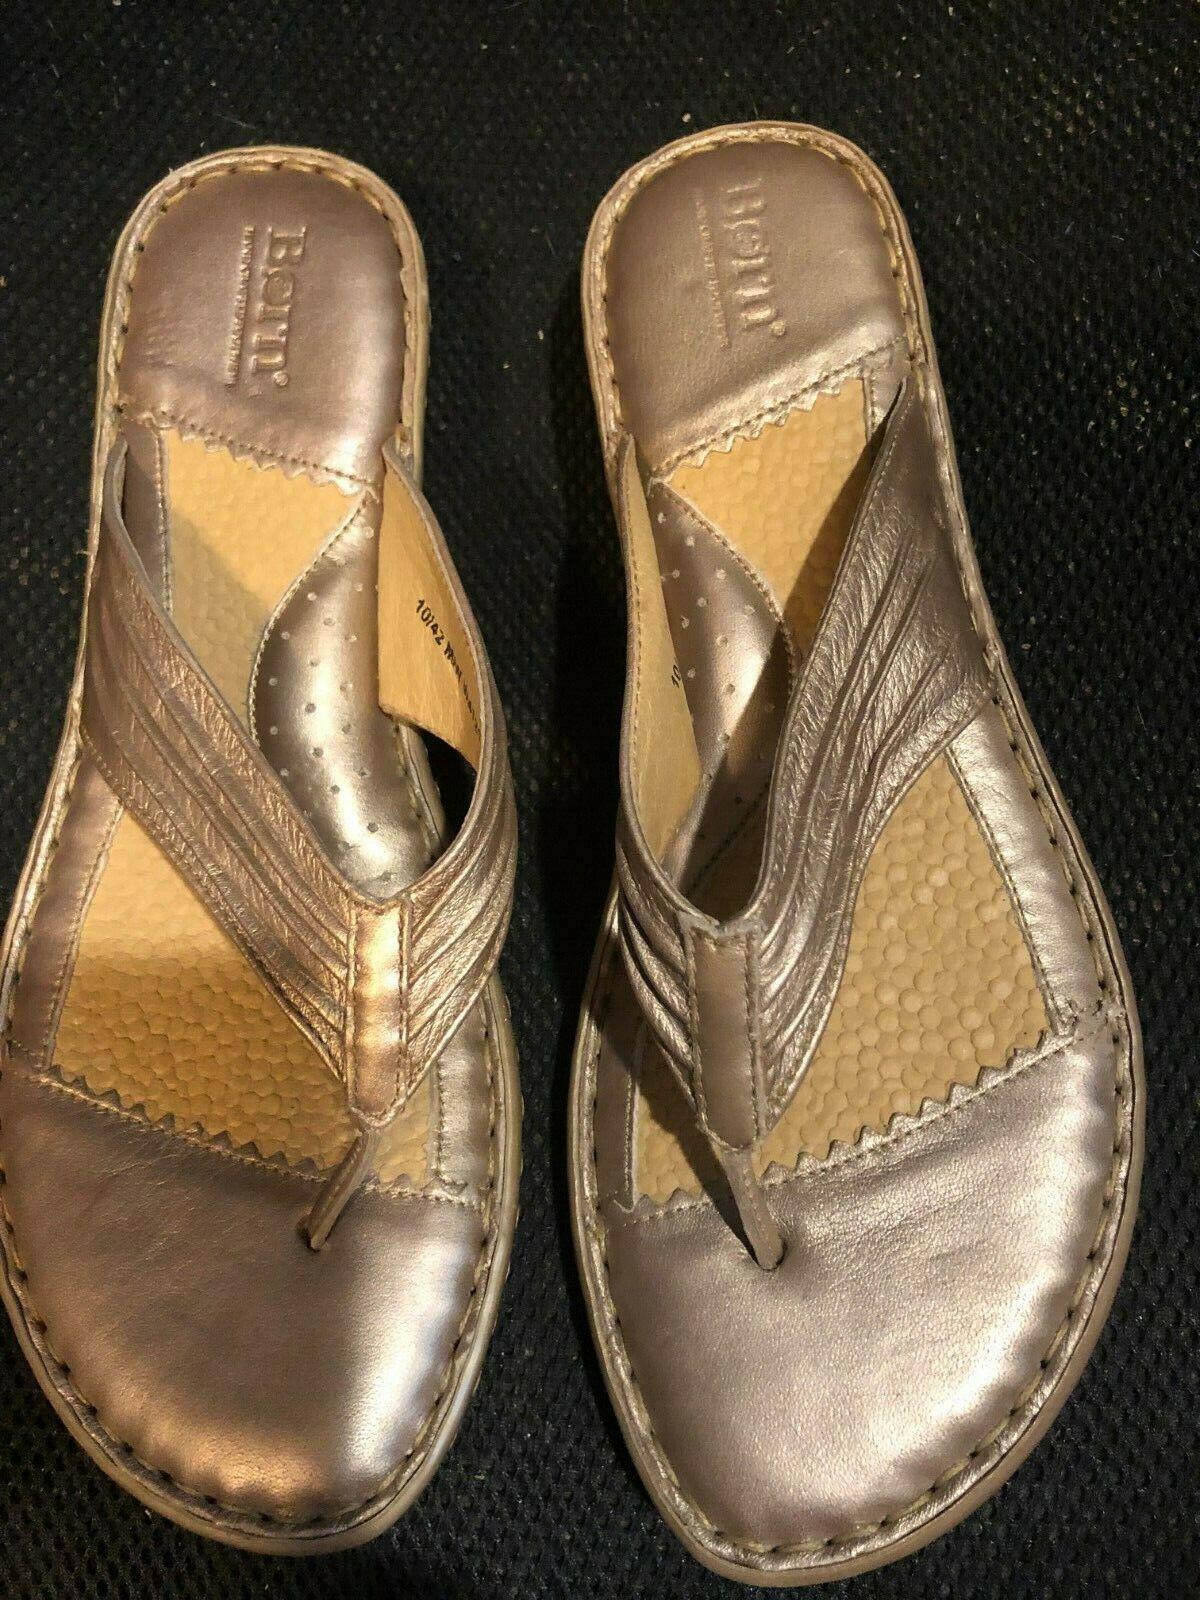 Sandals, BORN, light gold, thong, 1 1 2  heel, well cushioned foot beds, SZ  10M